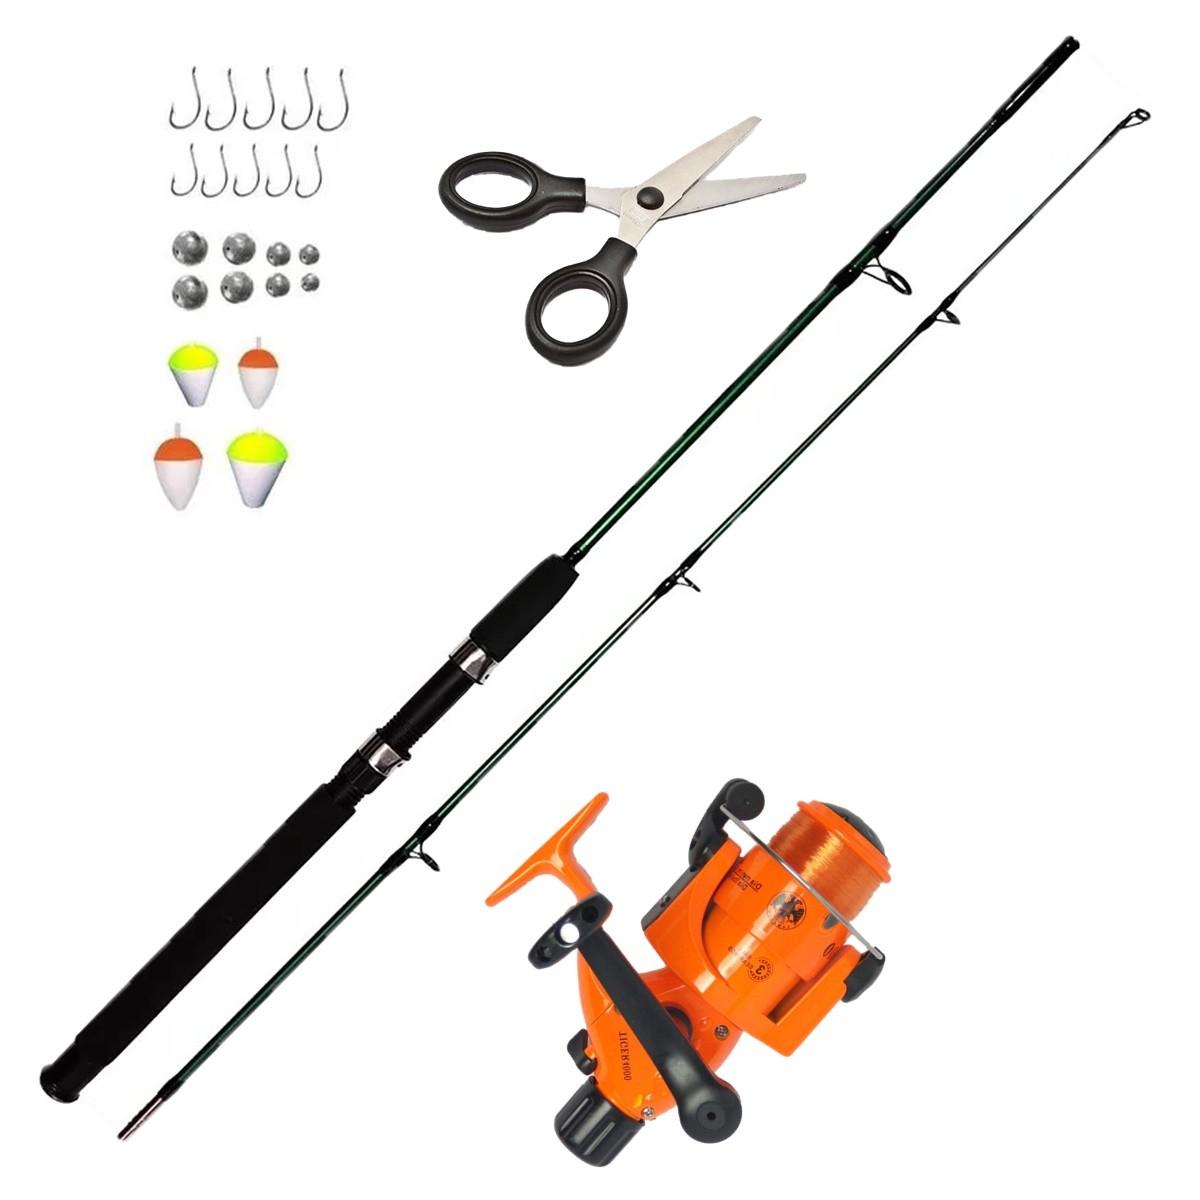 Kit De Pesca Peixes Até 15kg Vara 1,70m Molinete Acessorios